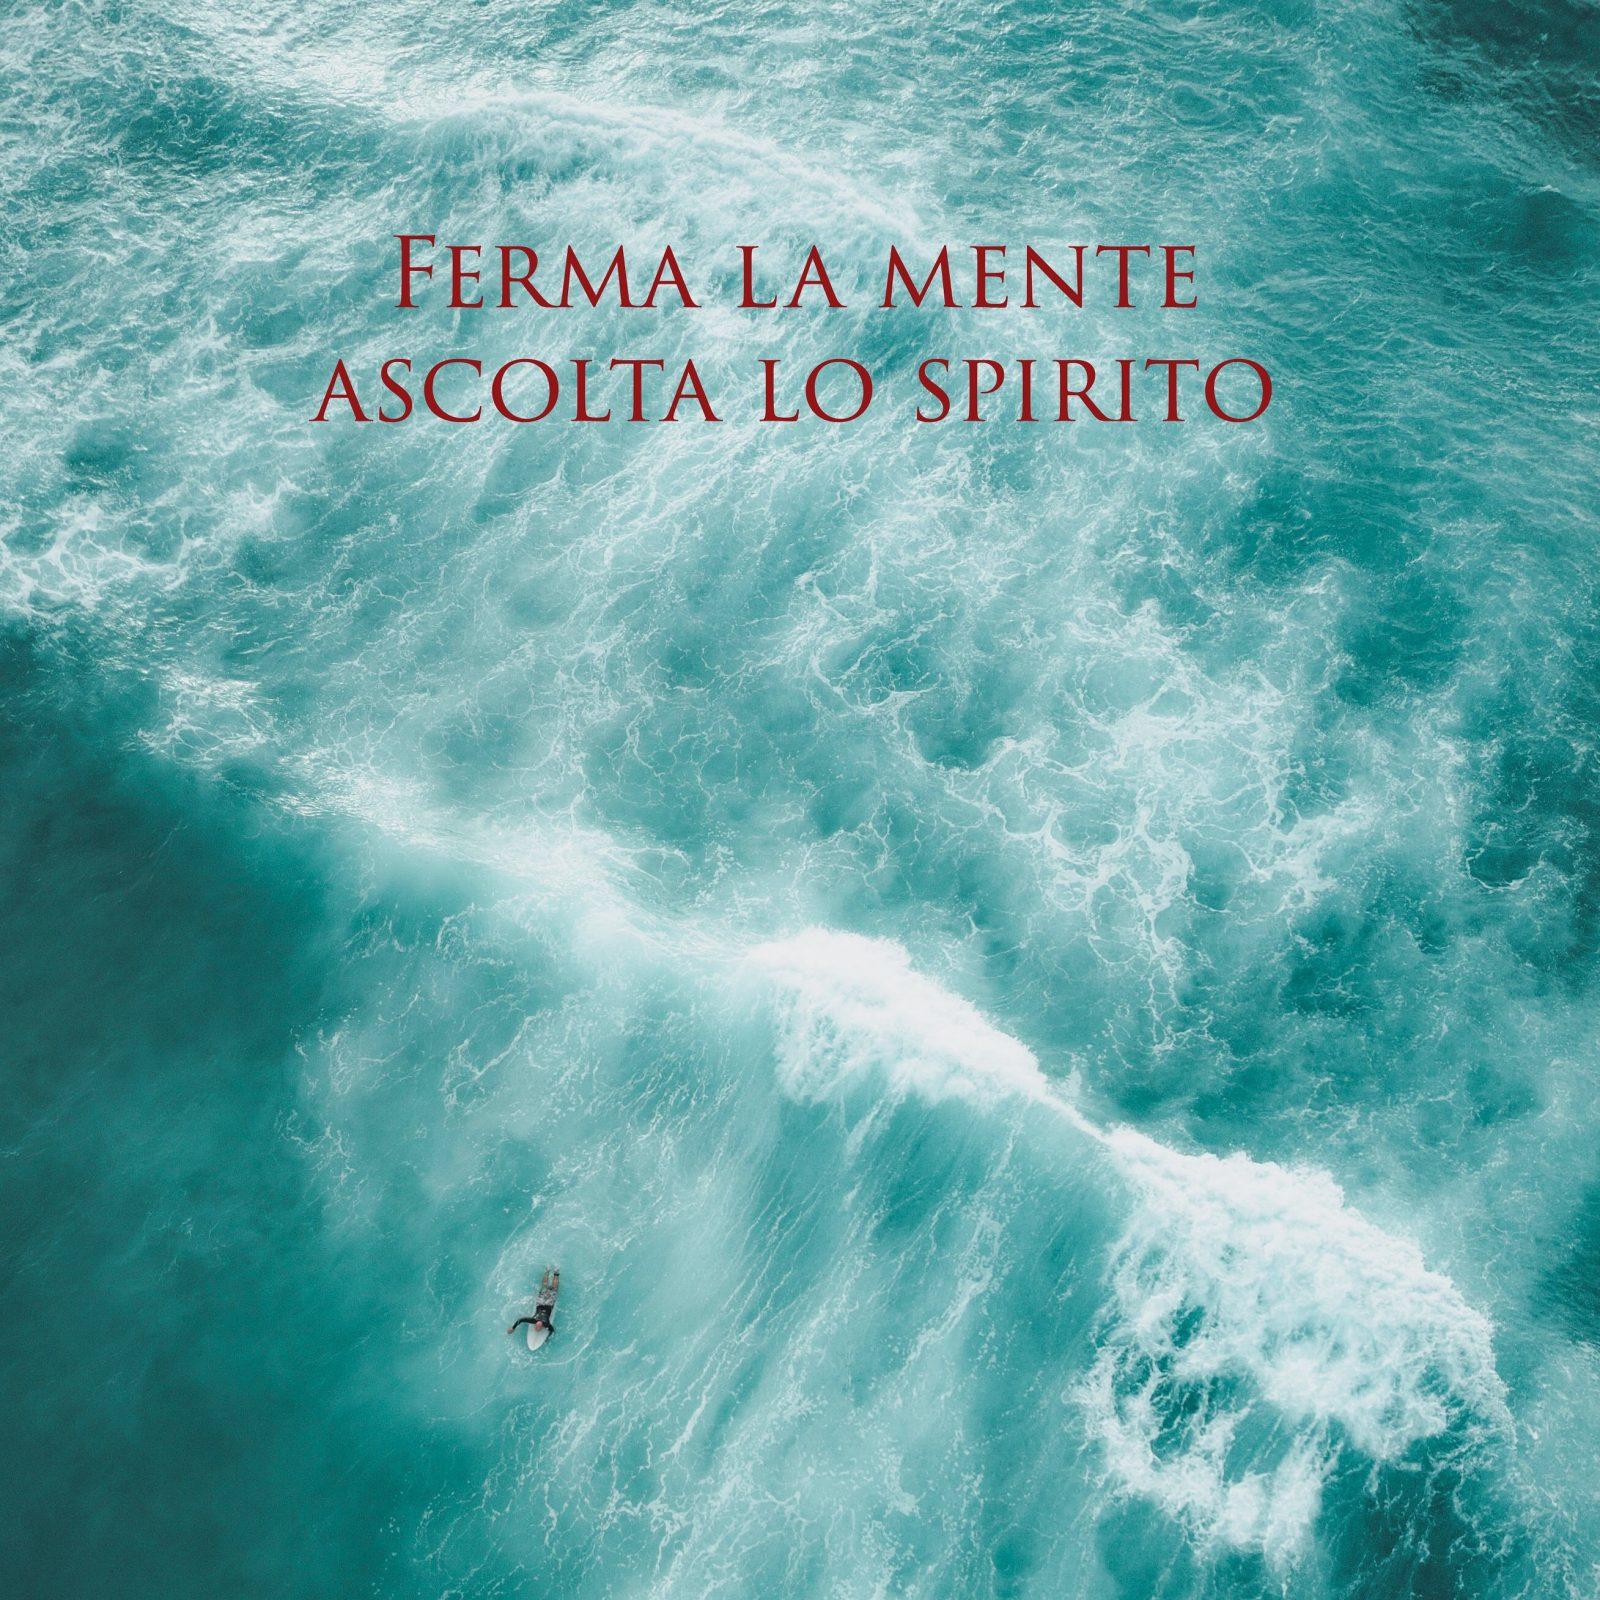 Ferma la mente -Psicologo Milano – dr. Enrico Gamba